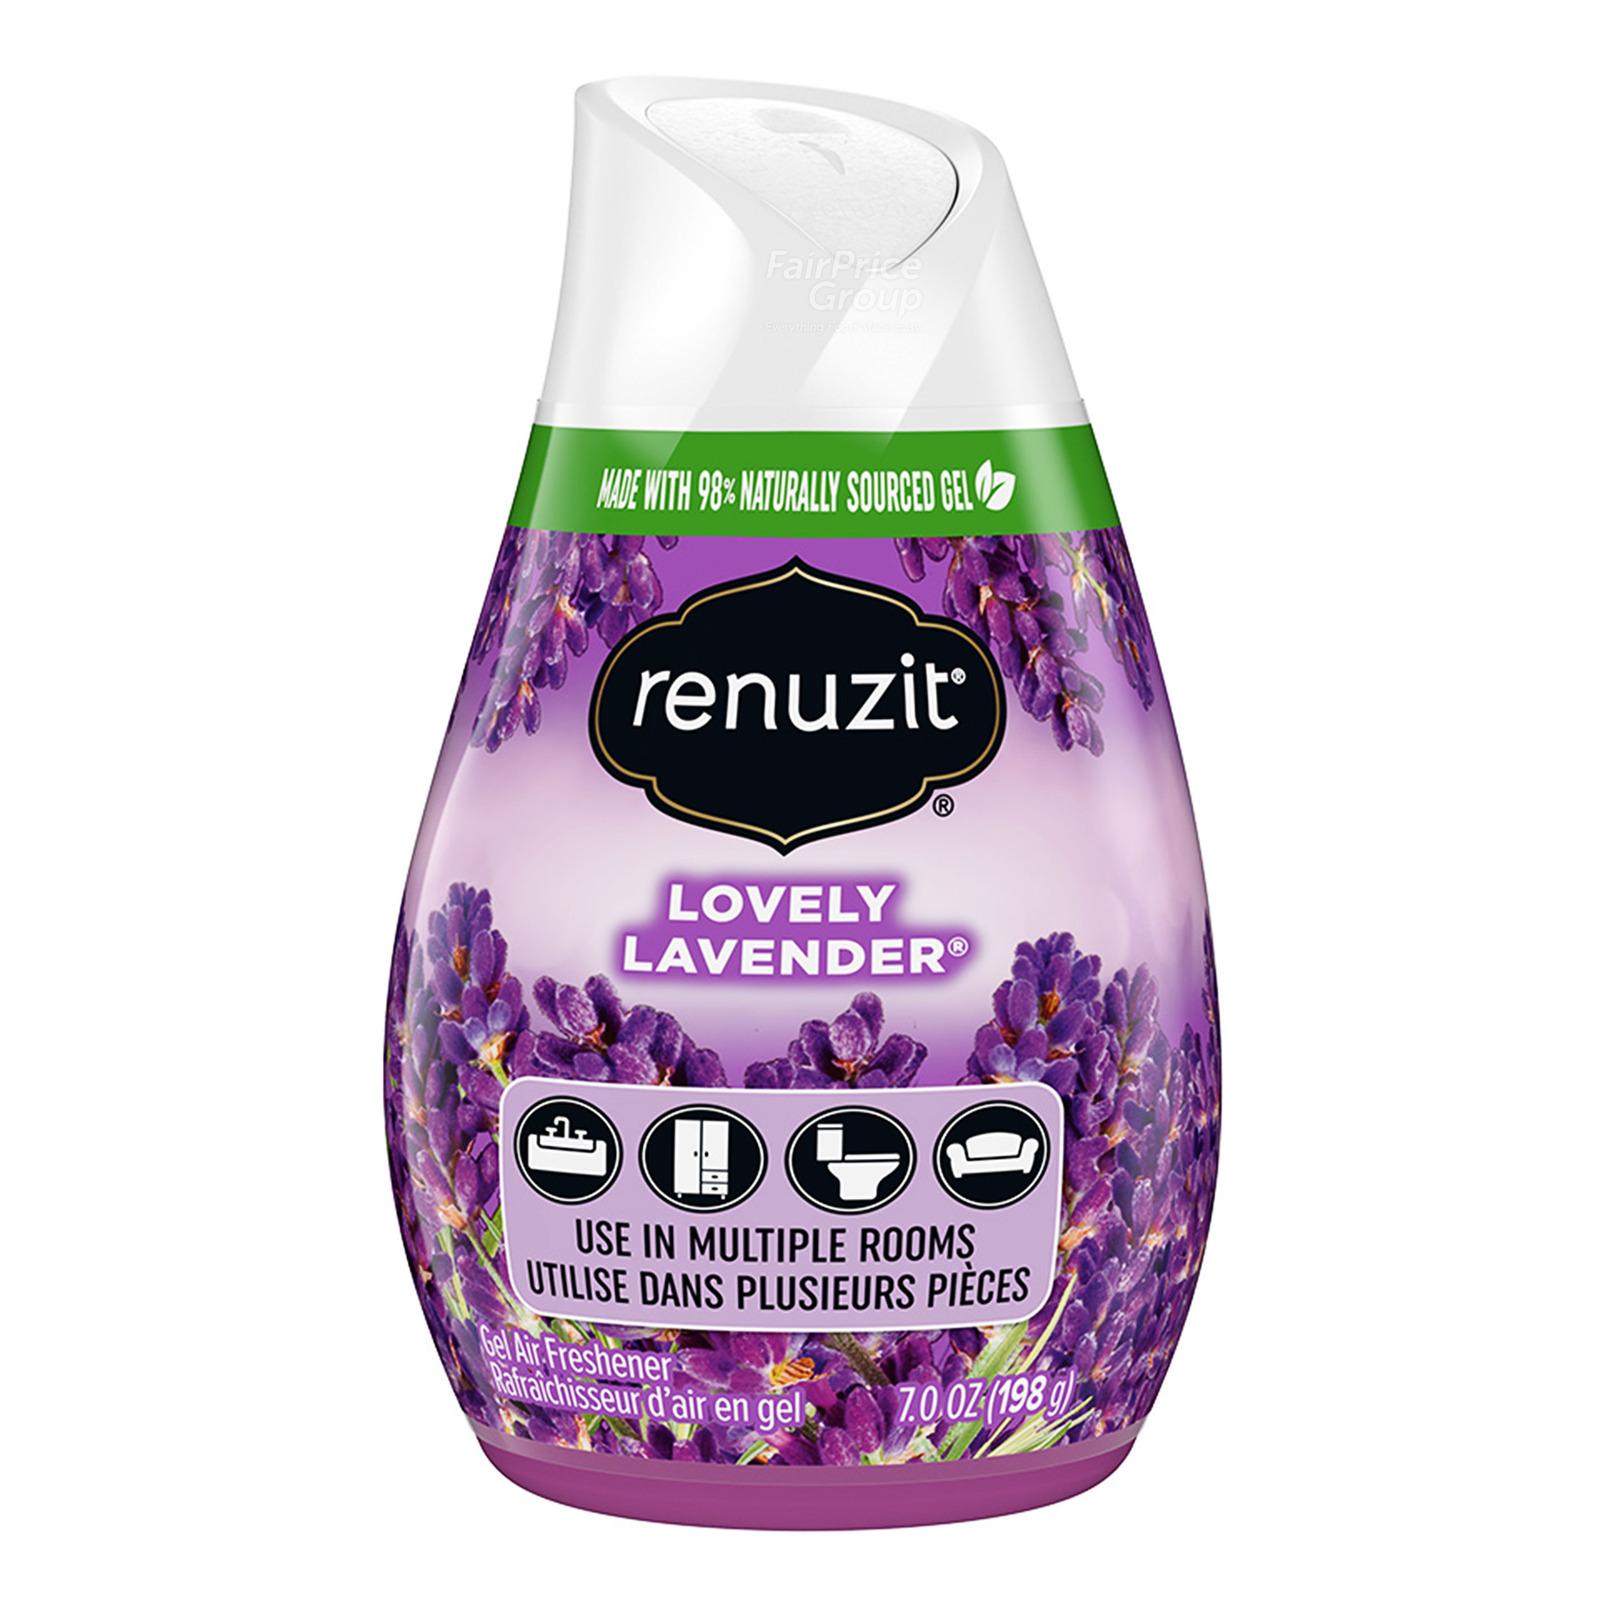 Renuzit Gel Air Freshener - Lovely Lavender